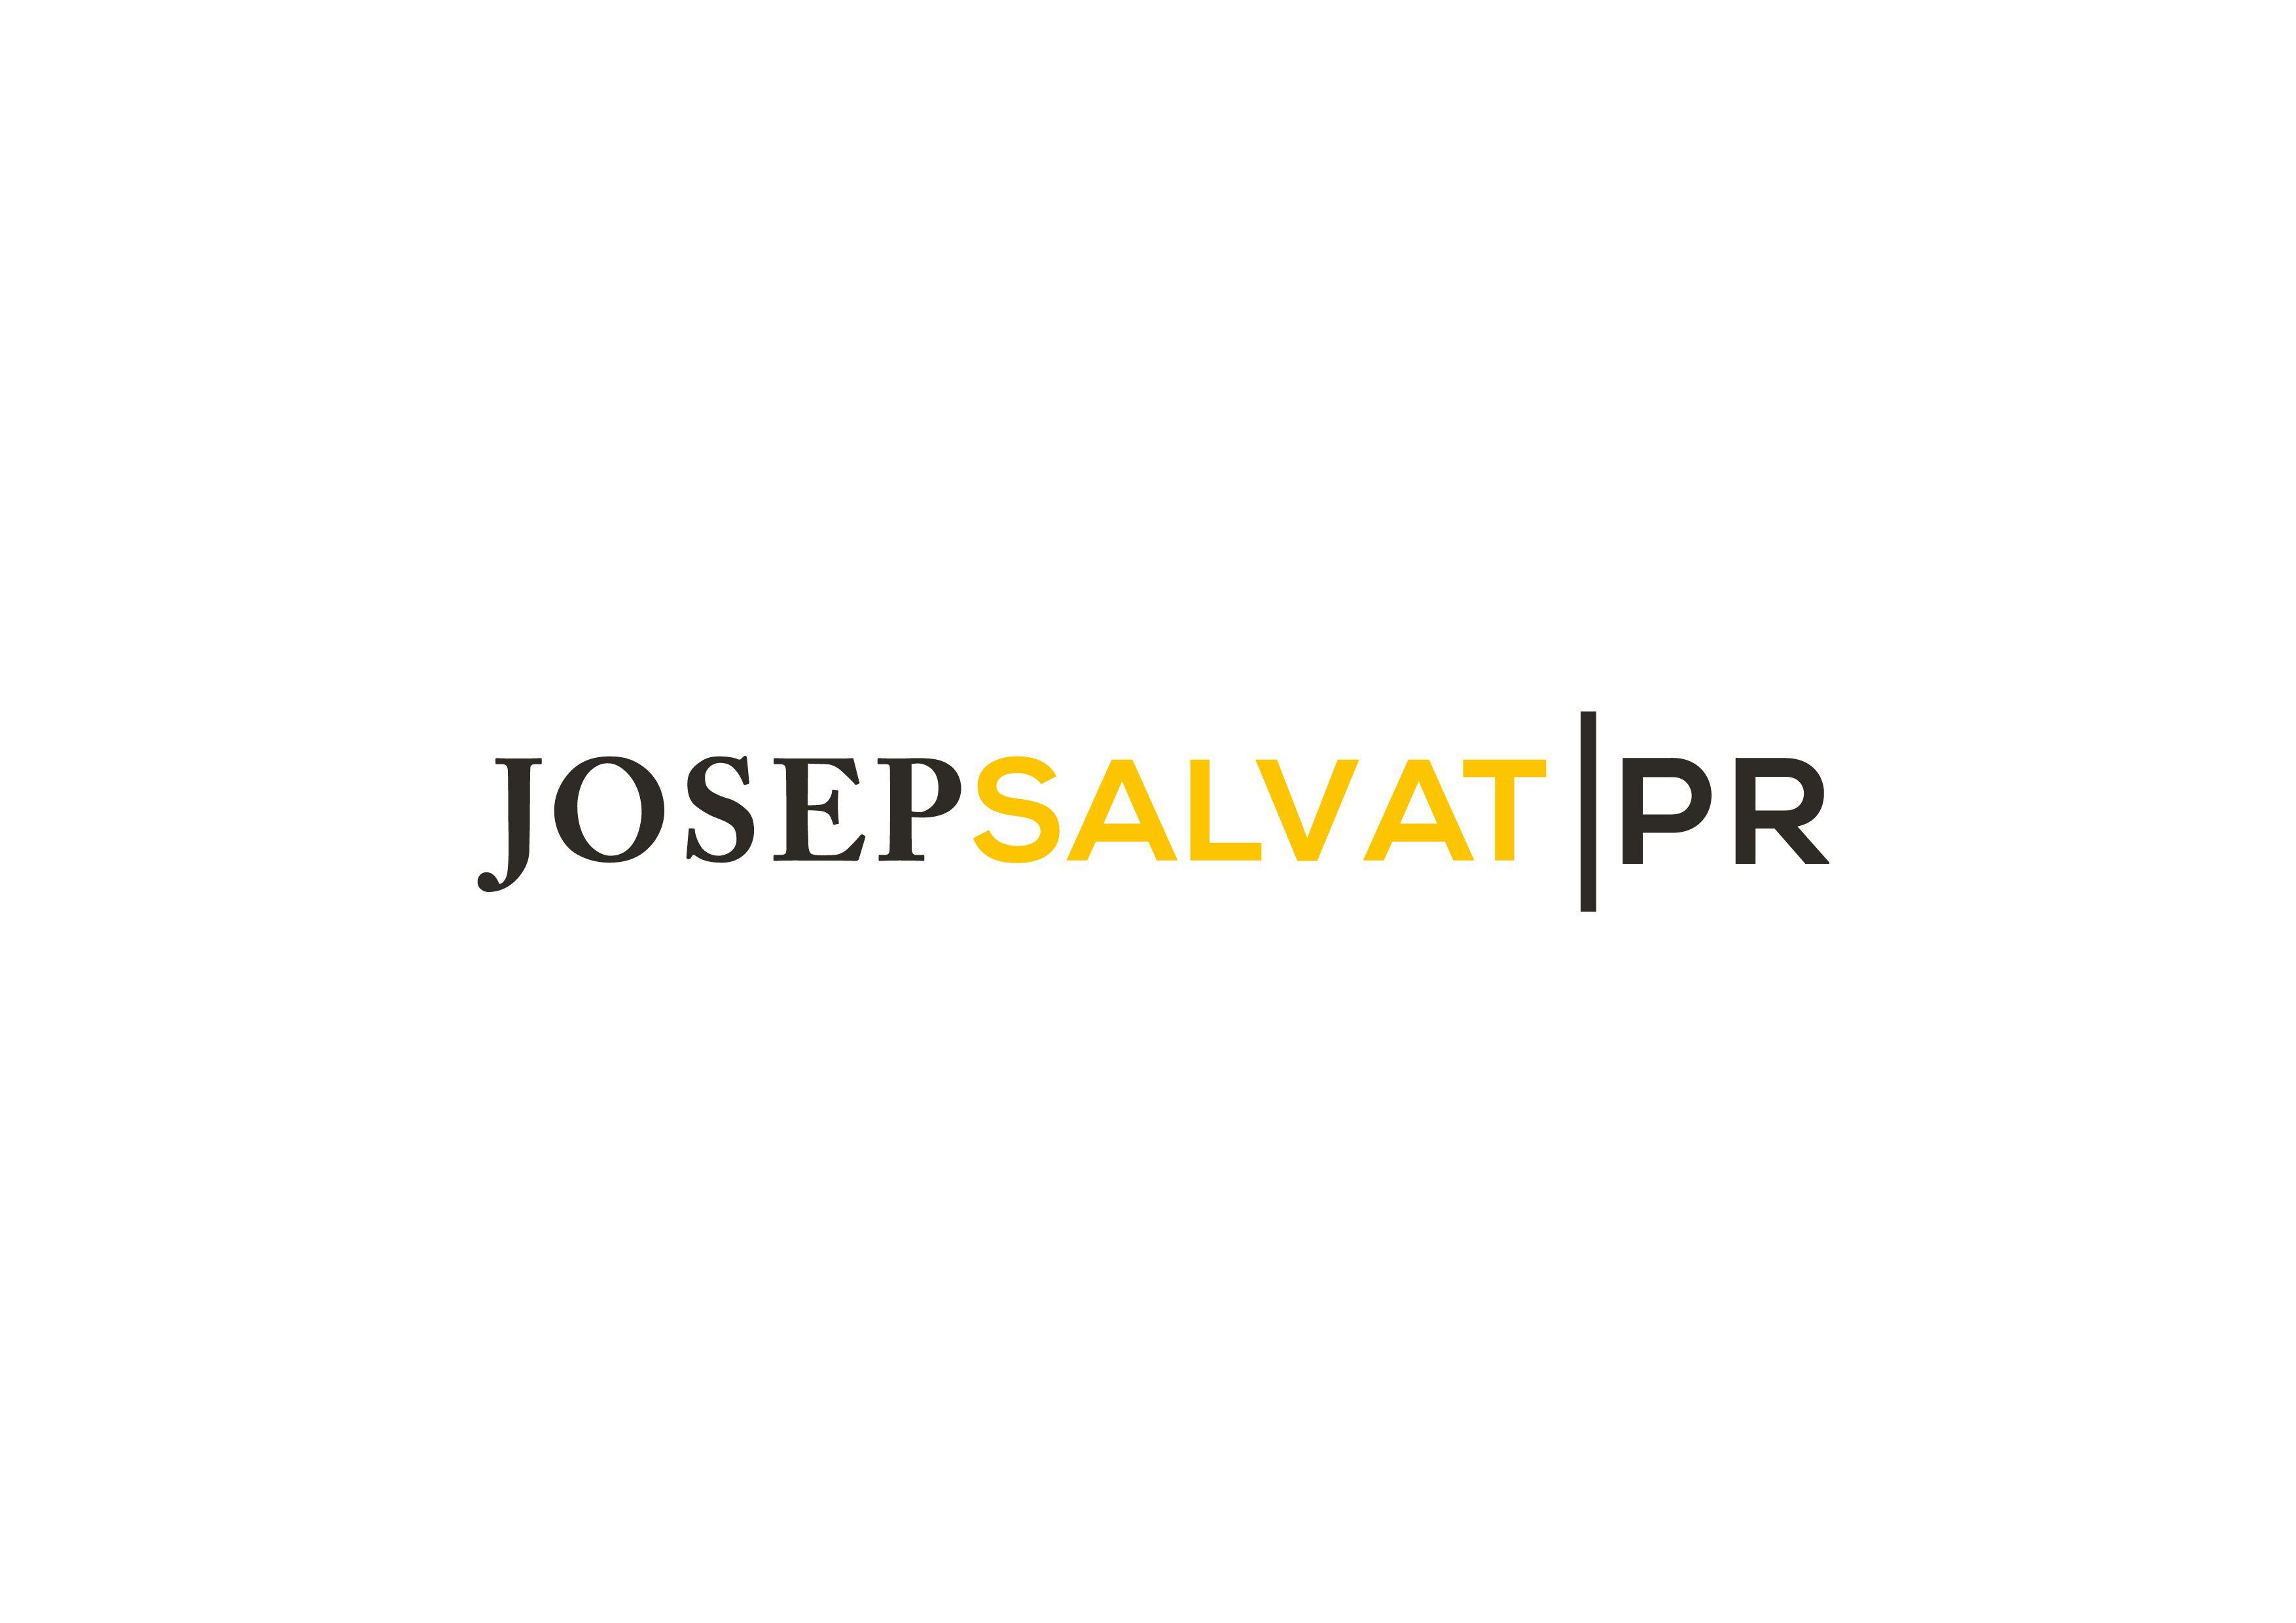 Foto de Logotipo de Josep Salvat PR